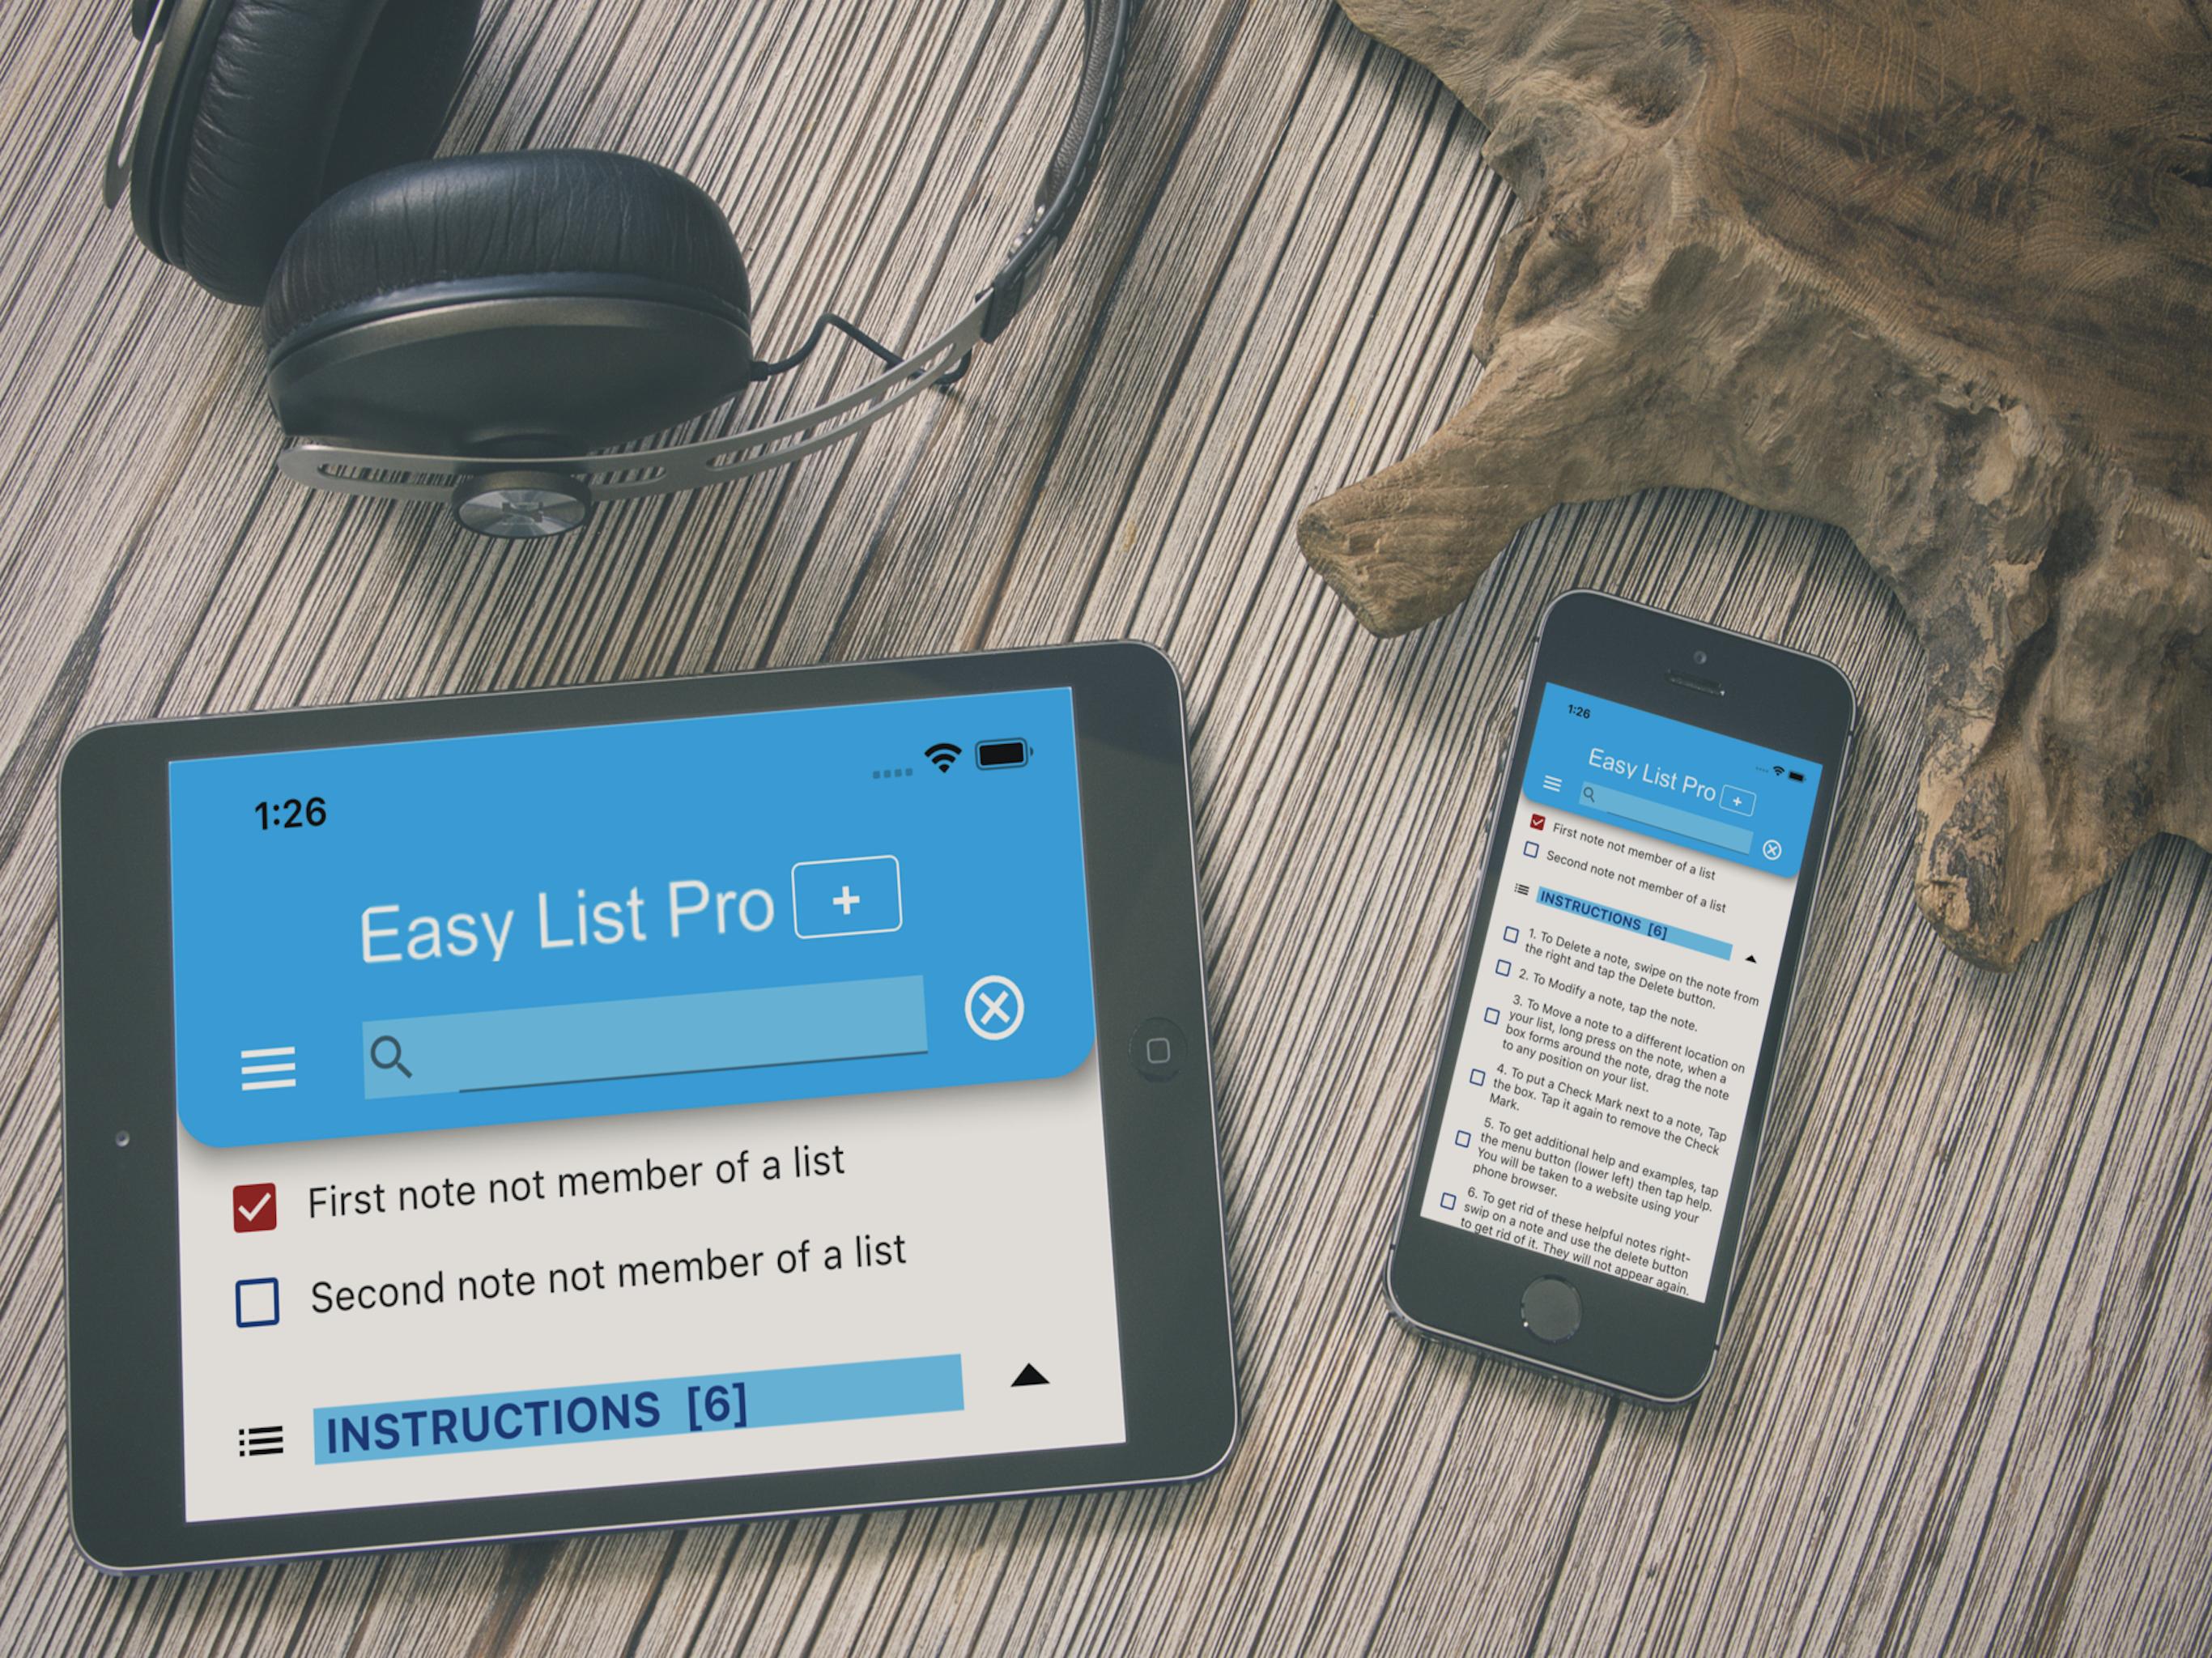 EasyList Pro